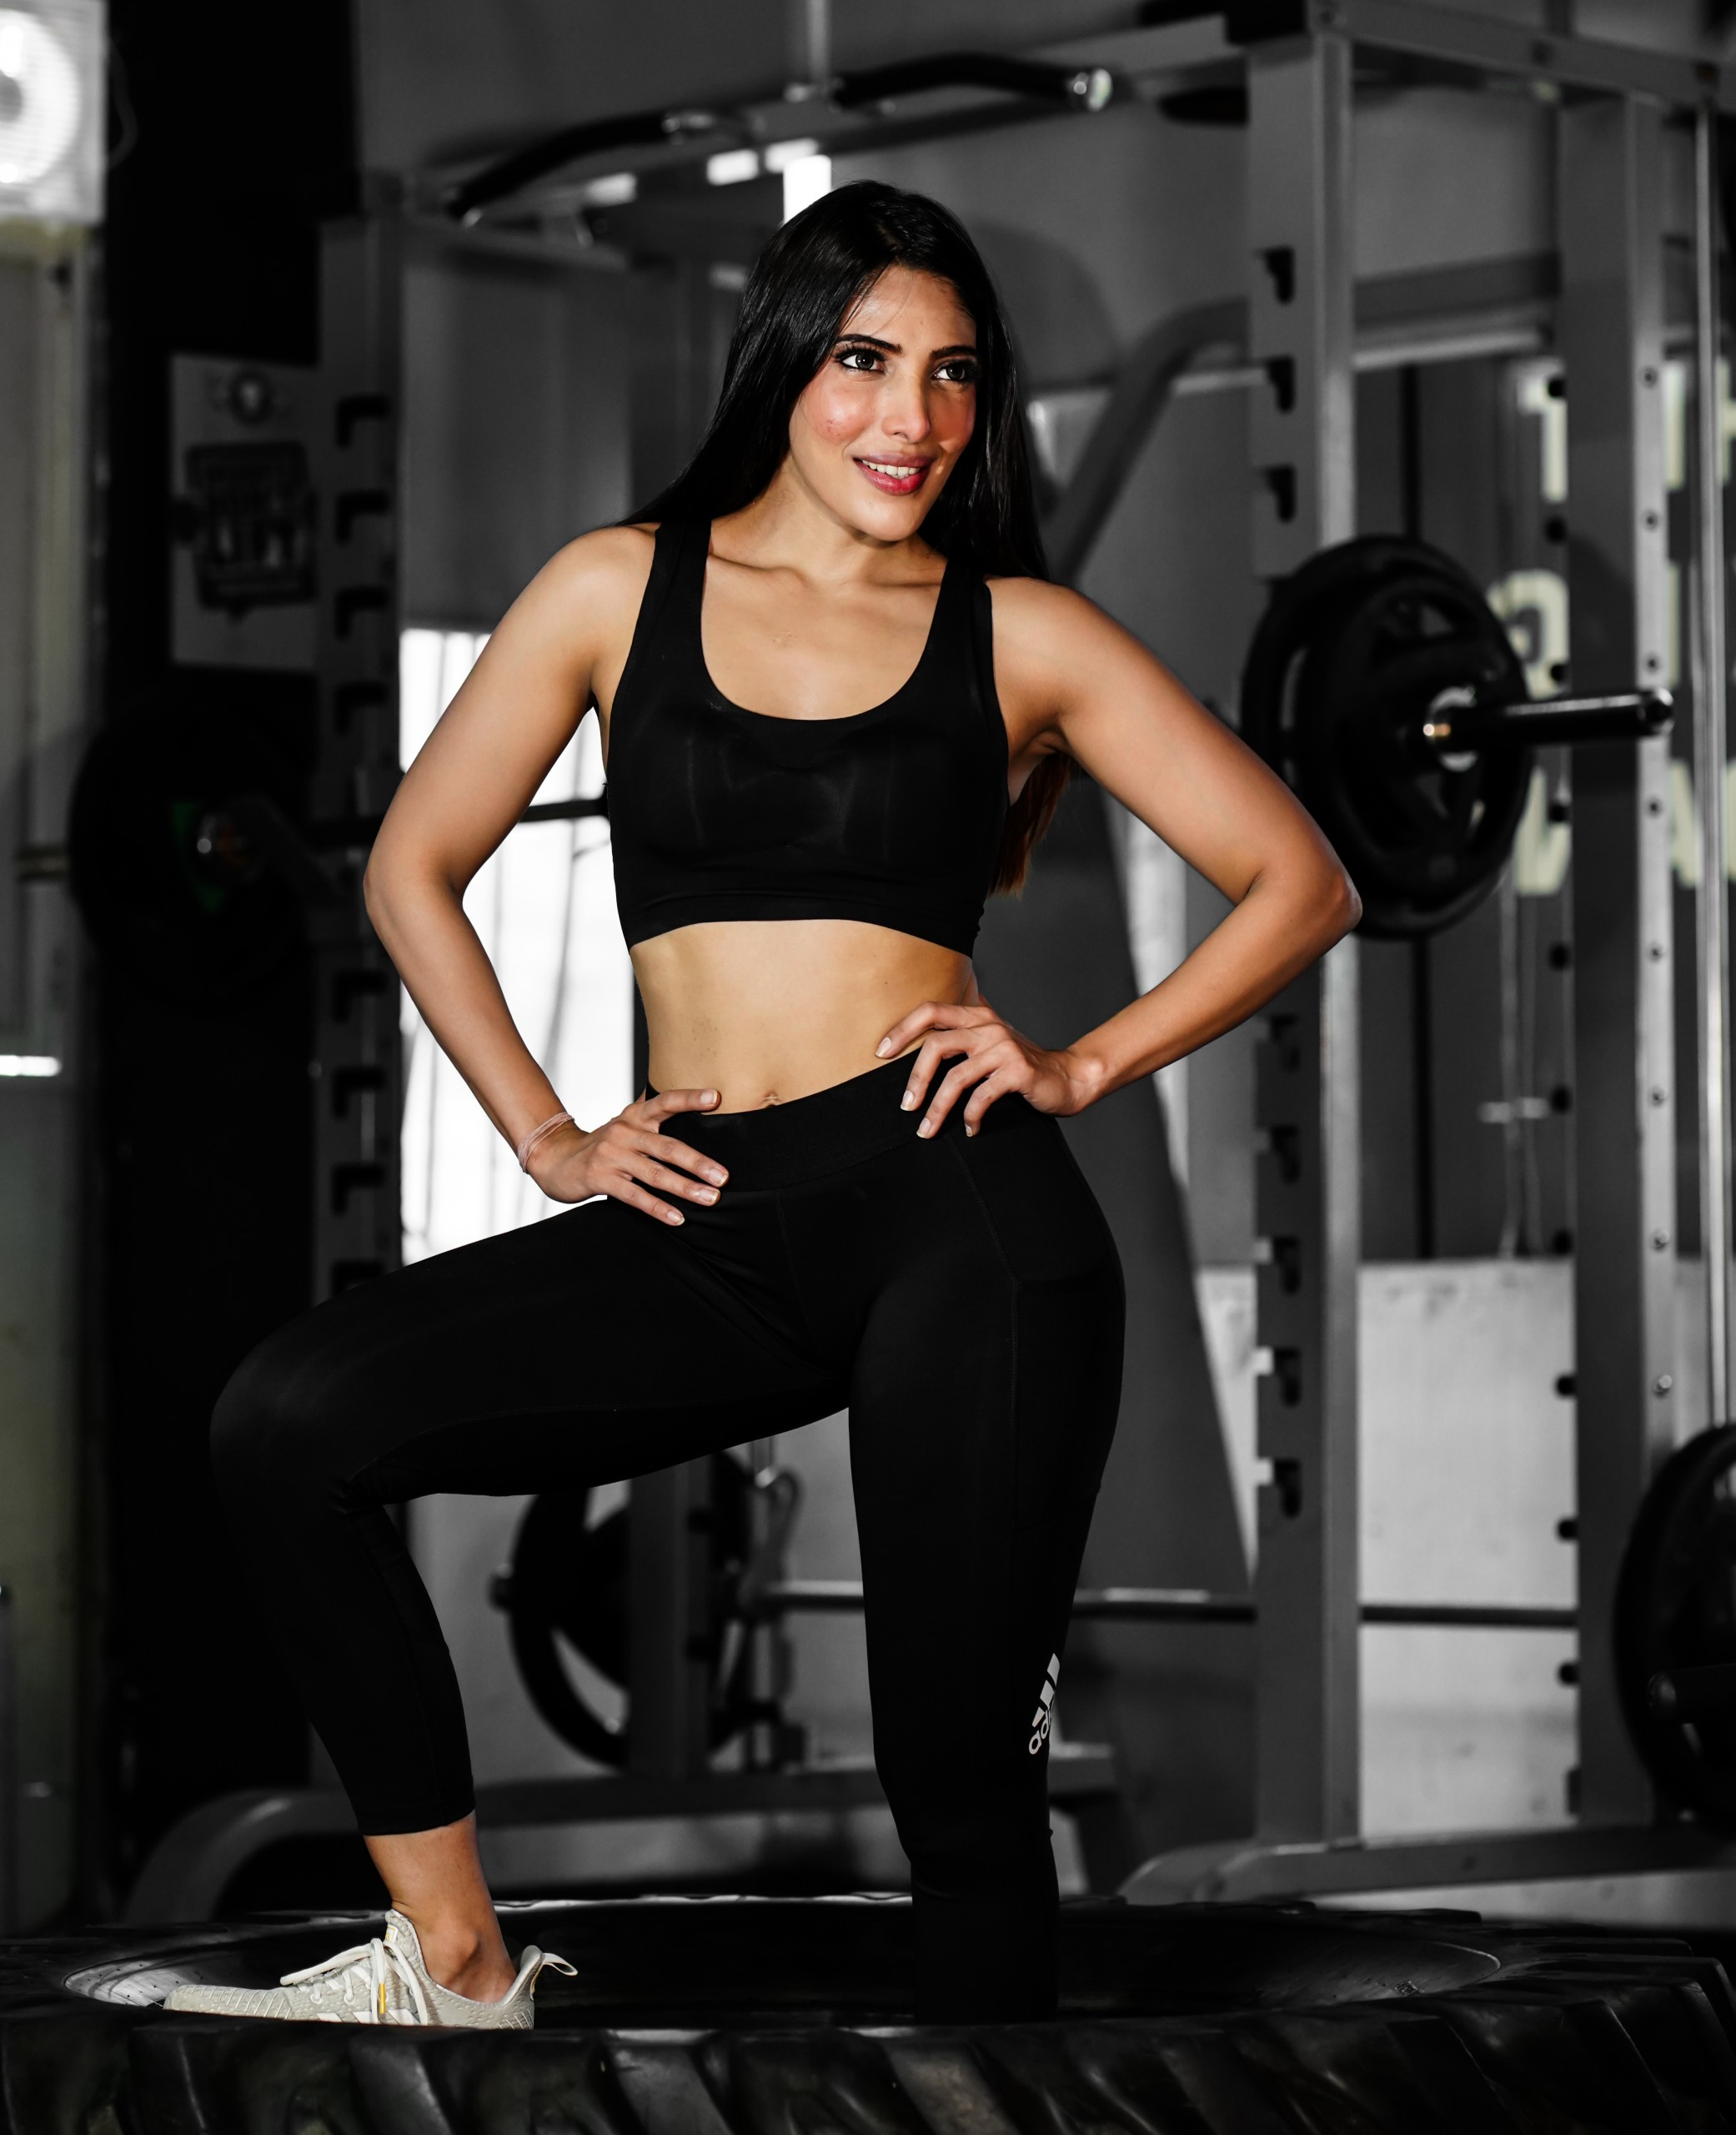 Female model pose after gym workout